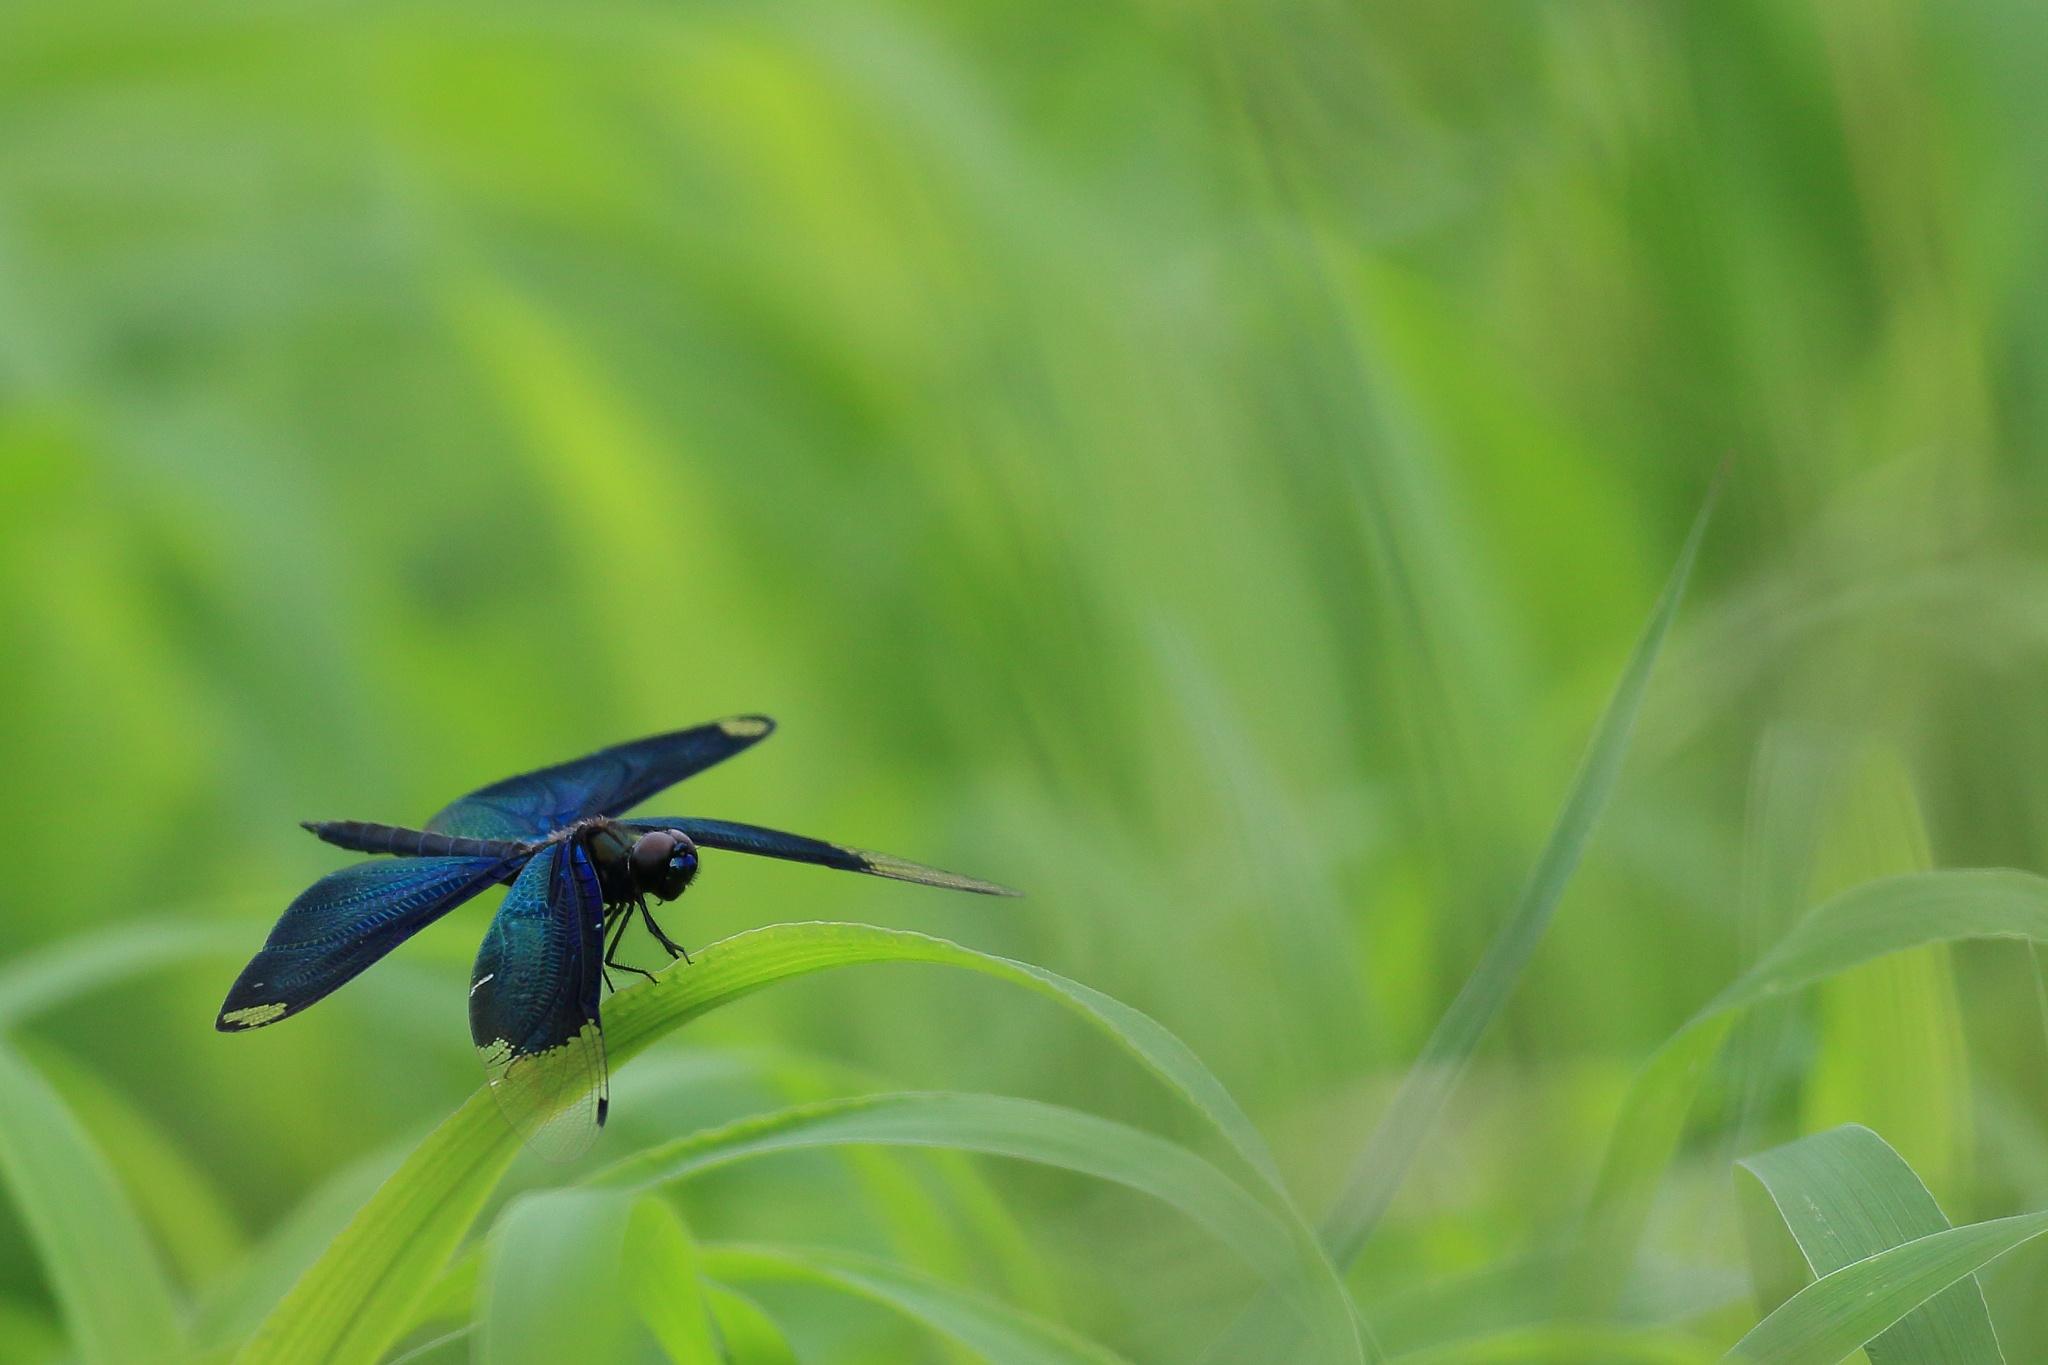 蝶蜻蛉 by Yoshiki Kamitsuji